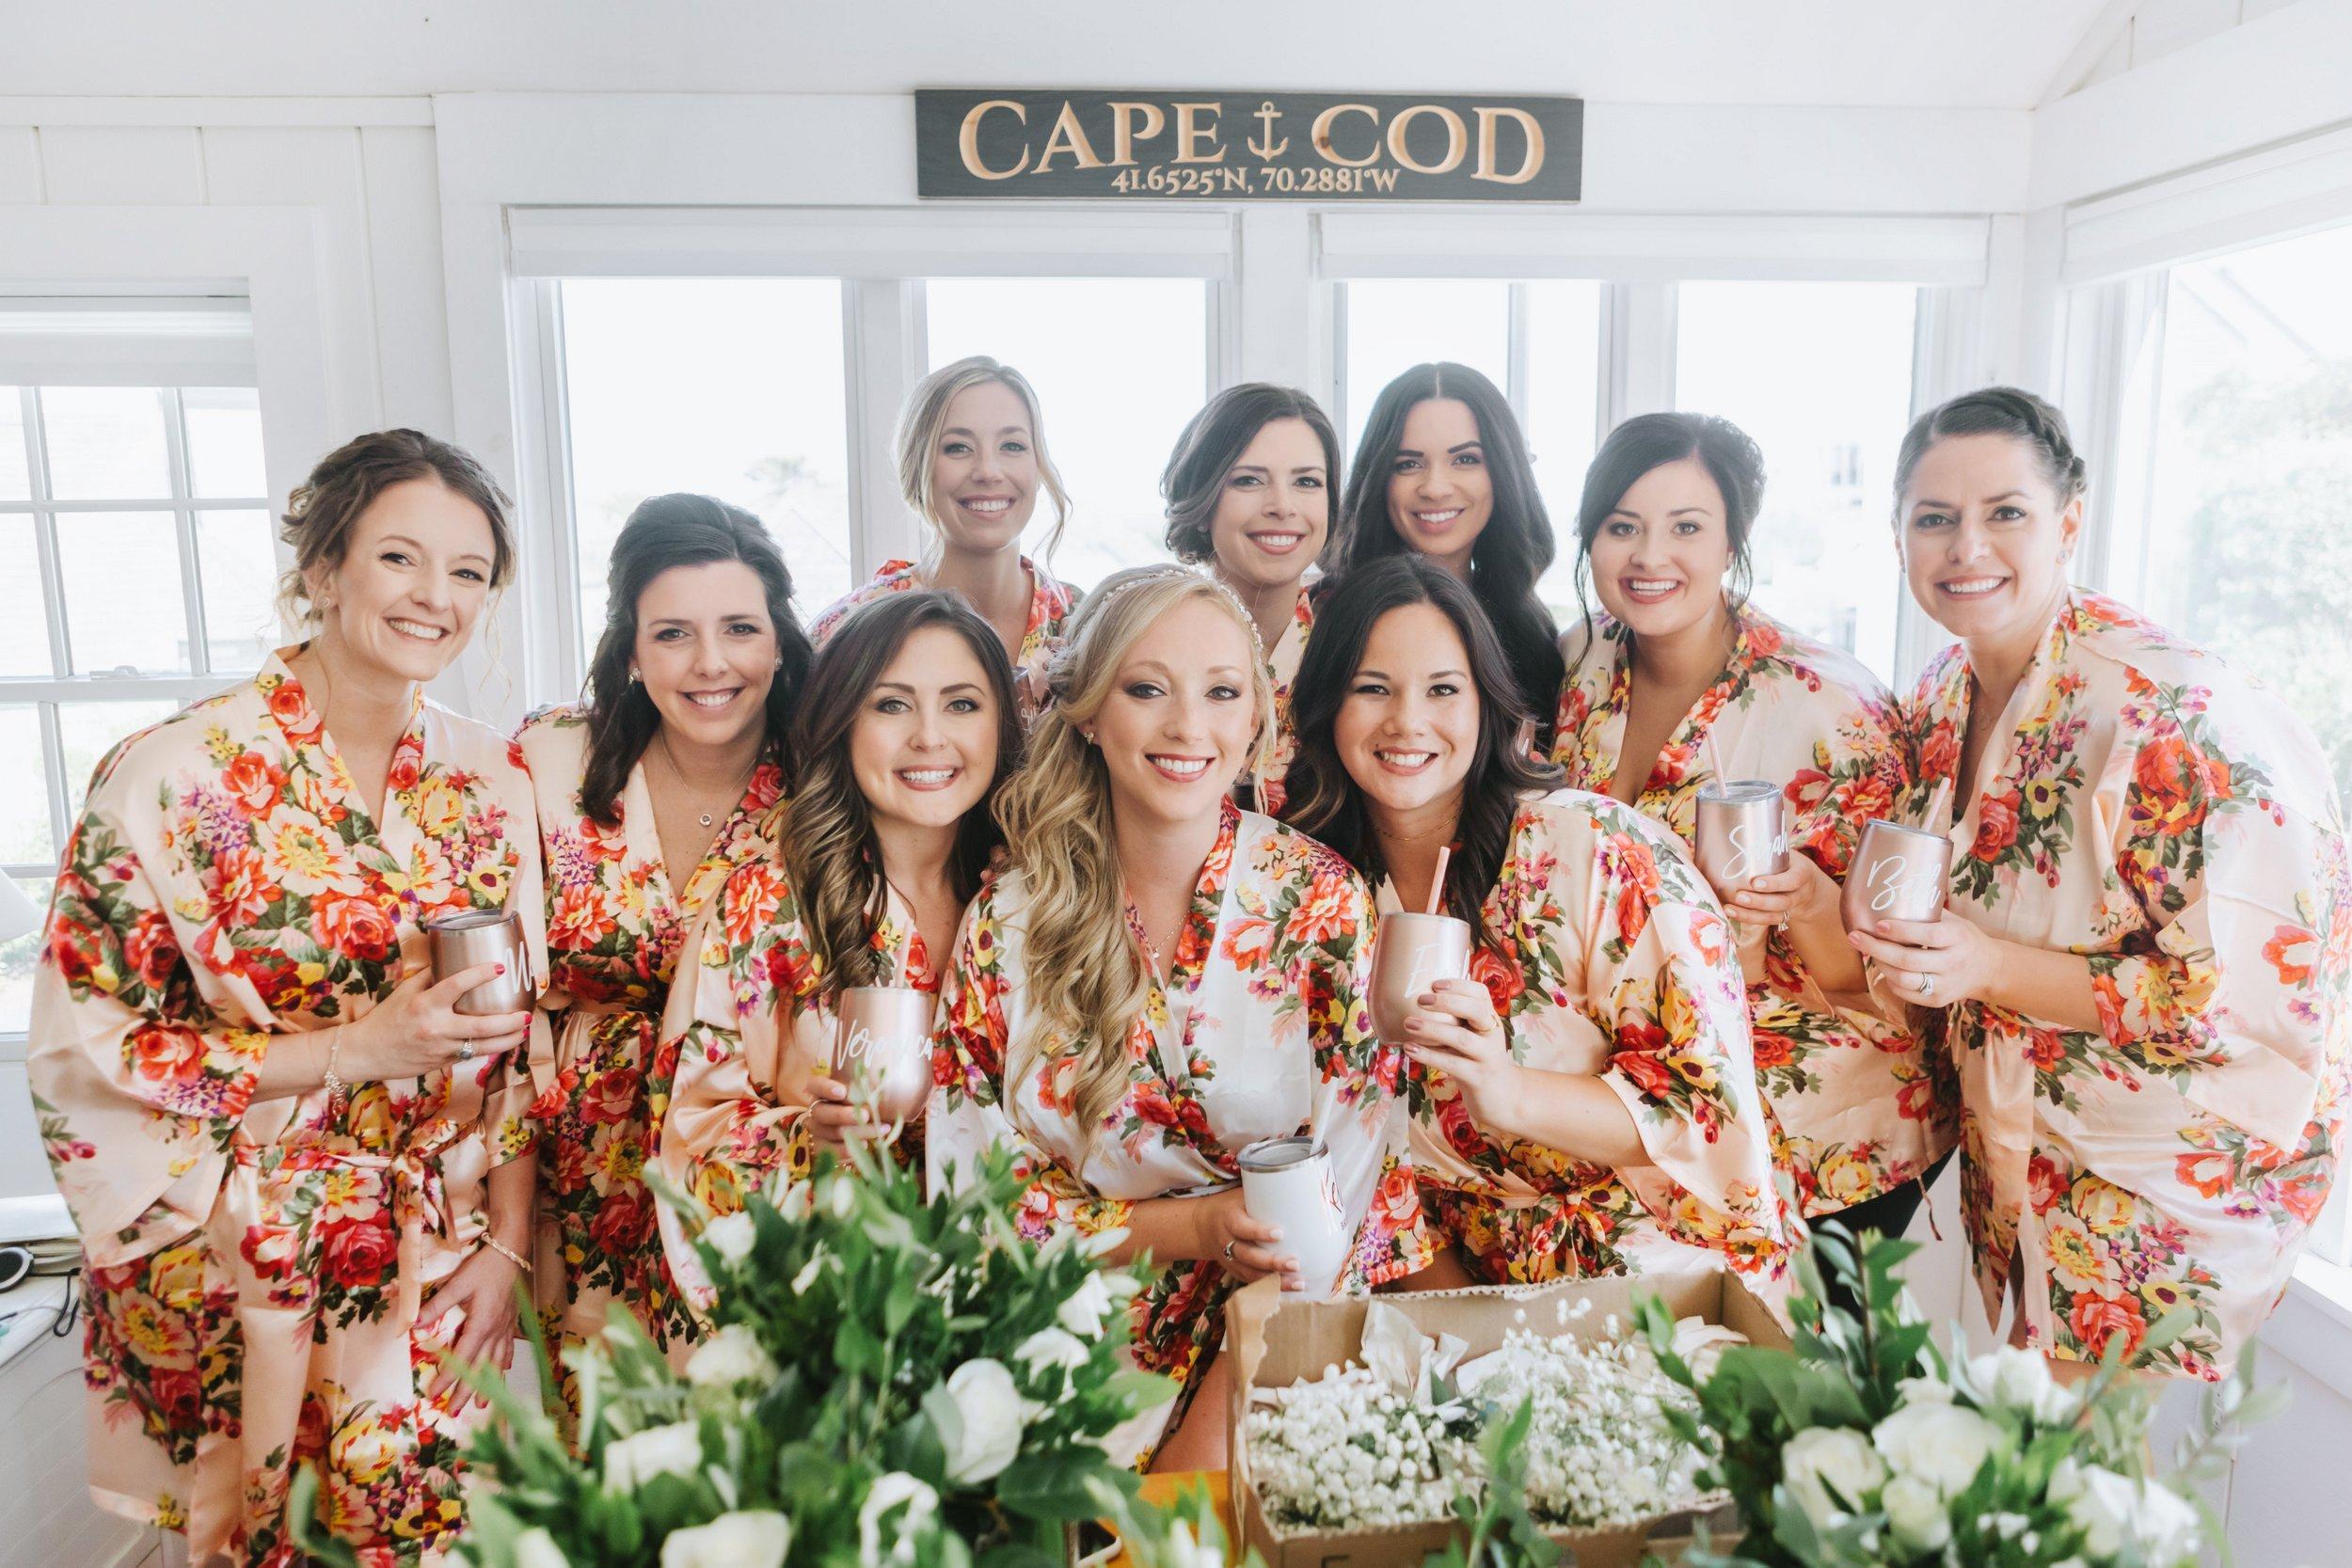 Popponesset-Inn-Wedding-Cape-Cod-Lena-Mirisola-Photography-3.jpg